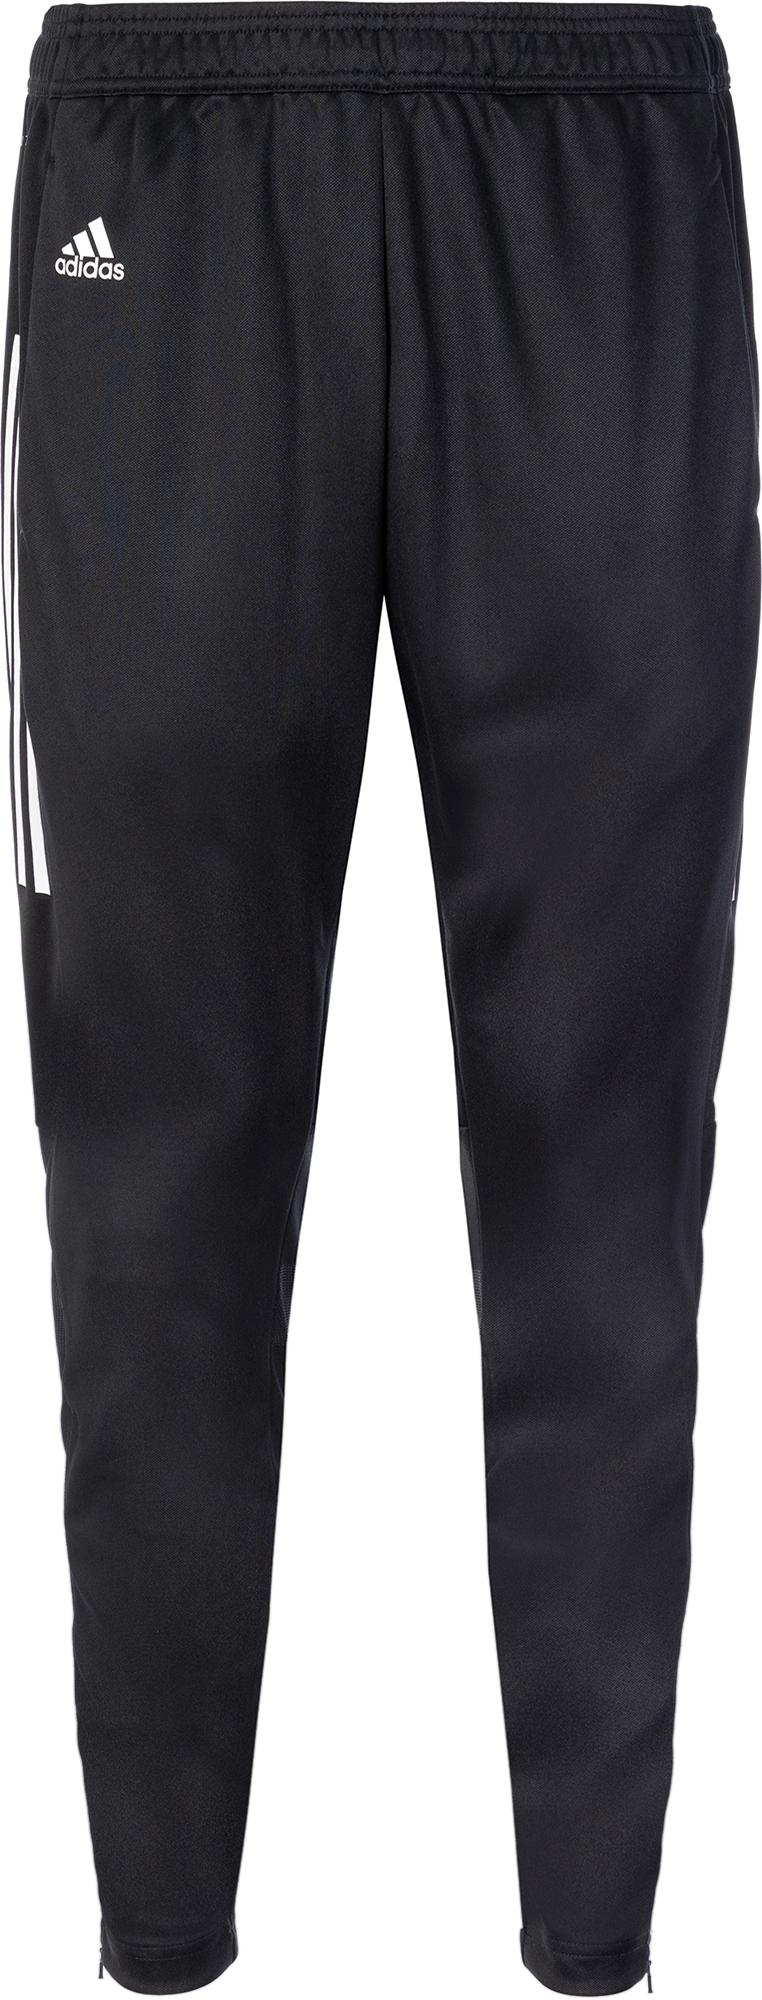 Adidas Брюки мужские Adidas, размер 54